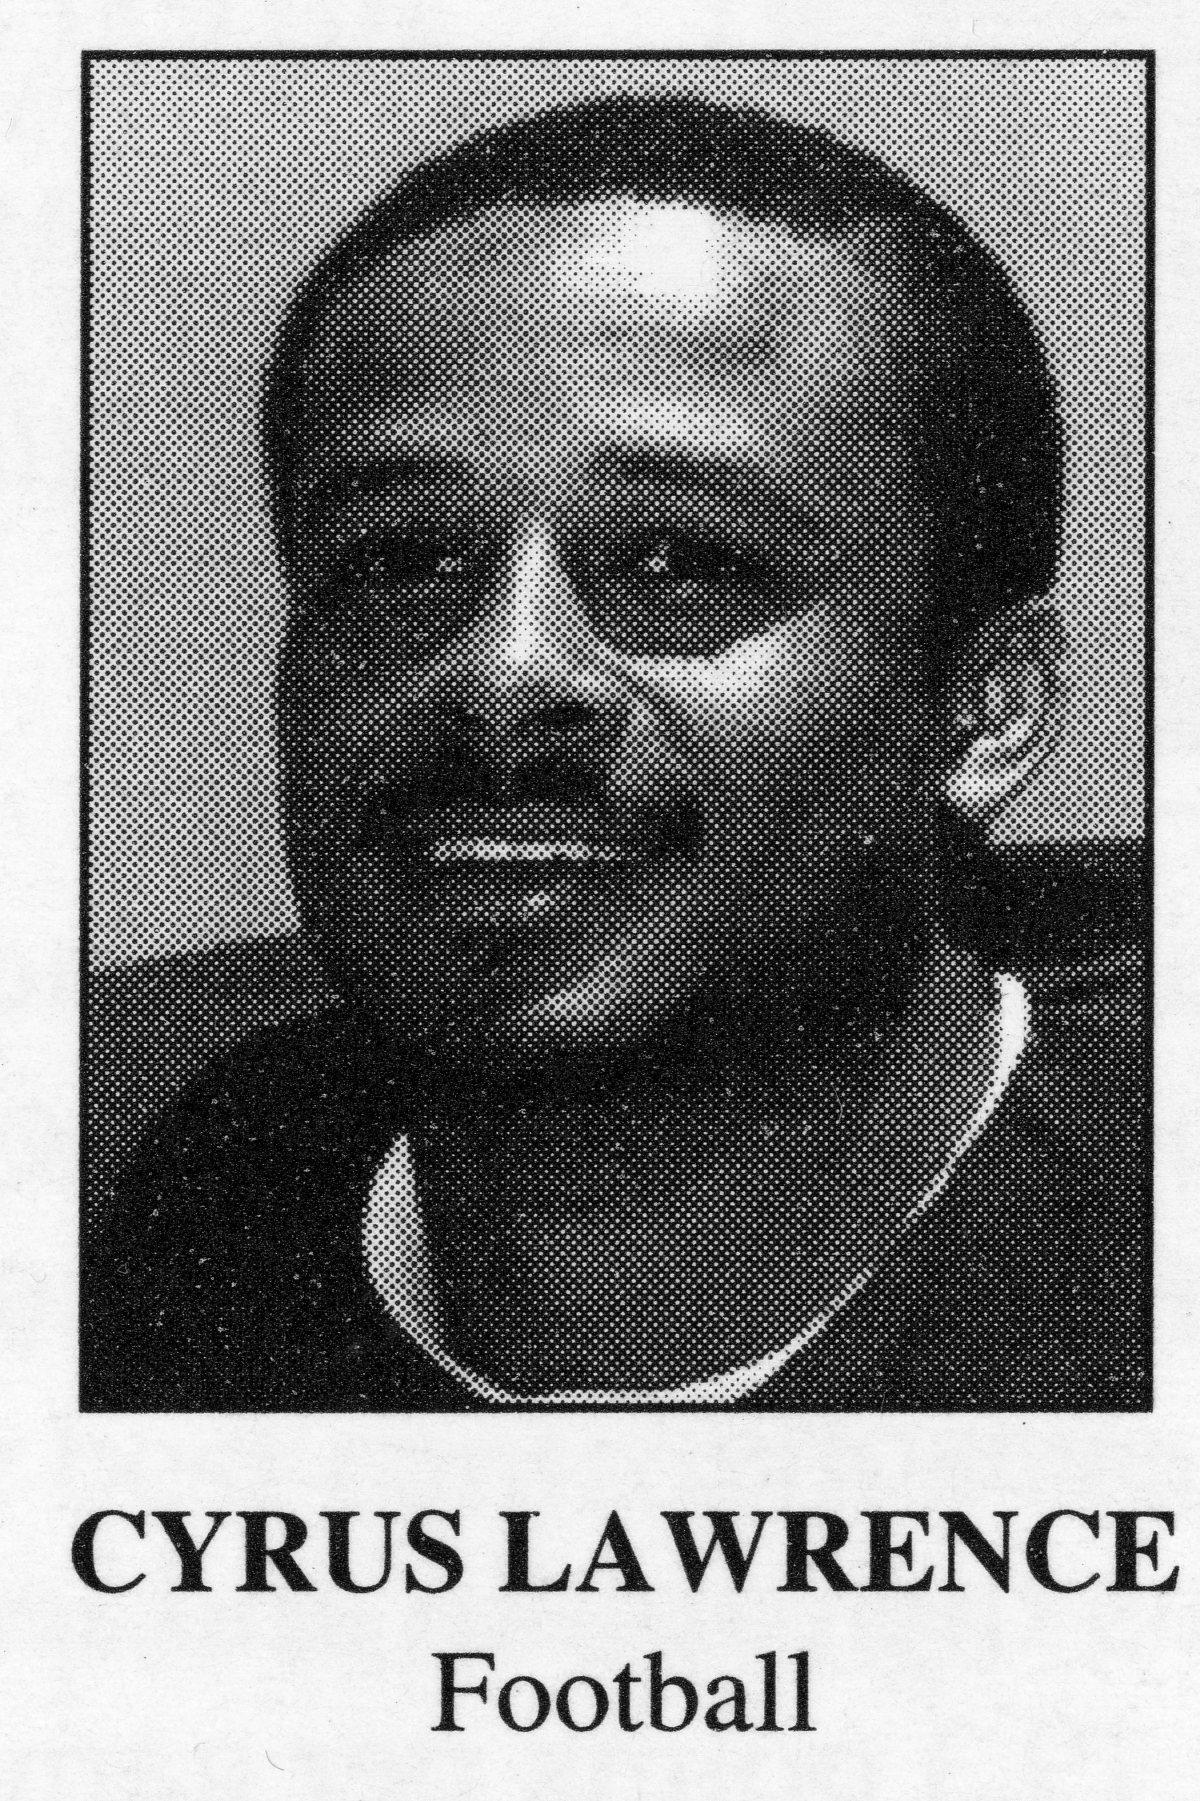 http://spec.lib.vt.edu/pickup/Omeka_upload/LawrenceCyrus_1998.jpg